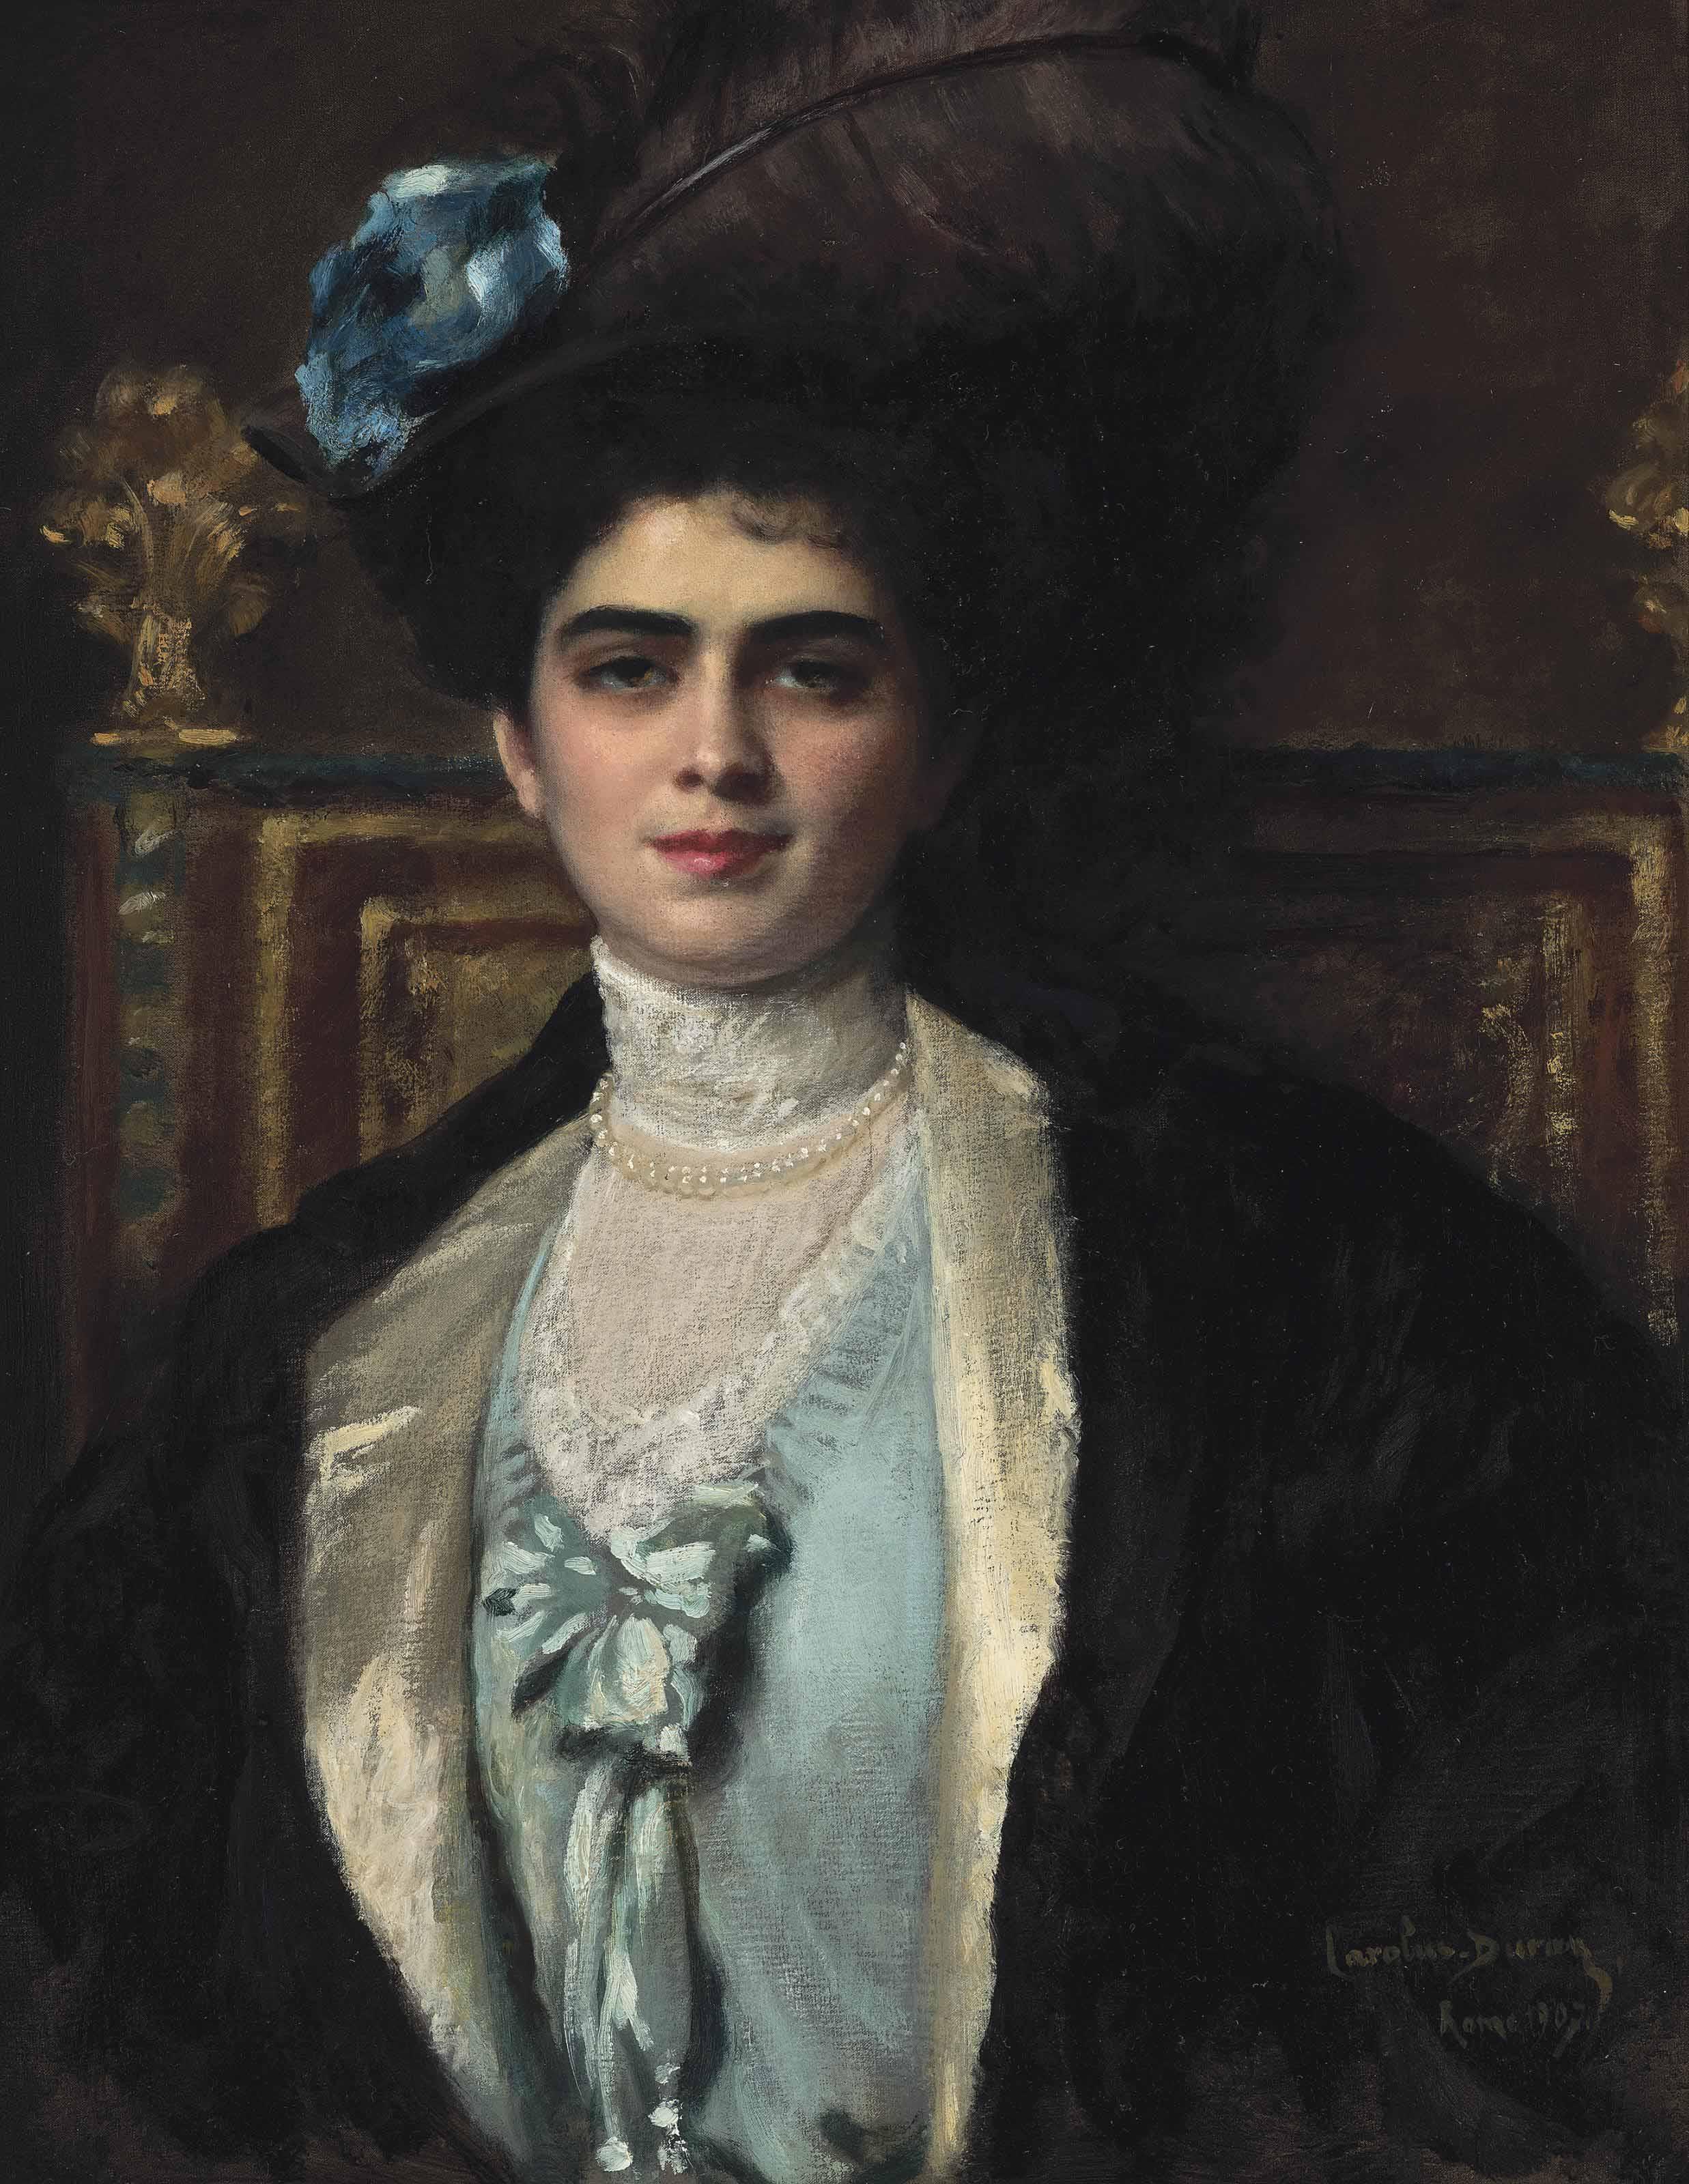 Madame Lafourcade née Cortira à la Havane